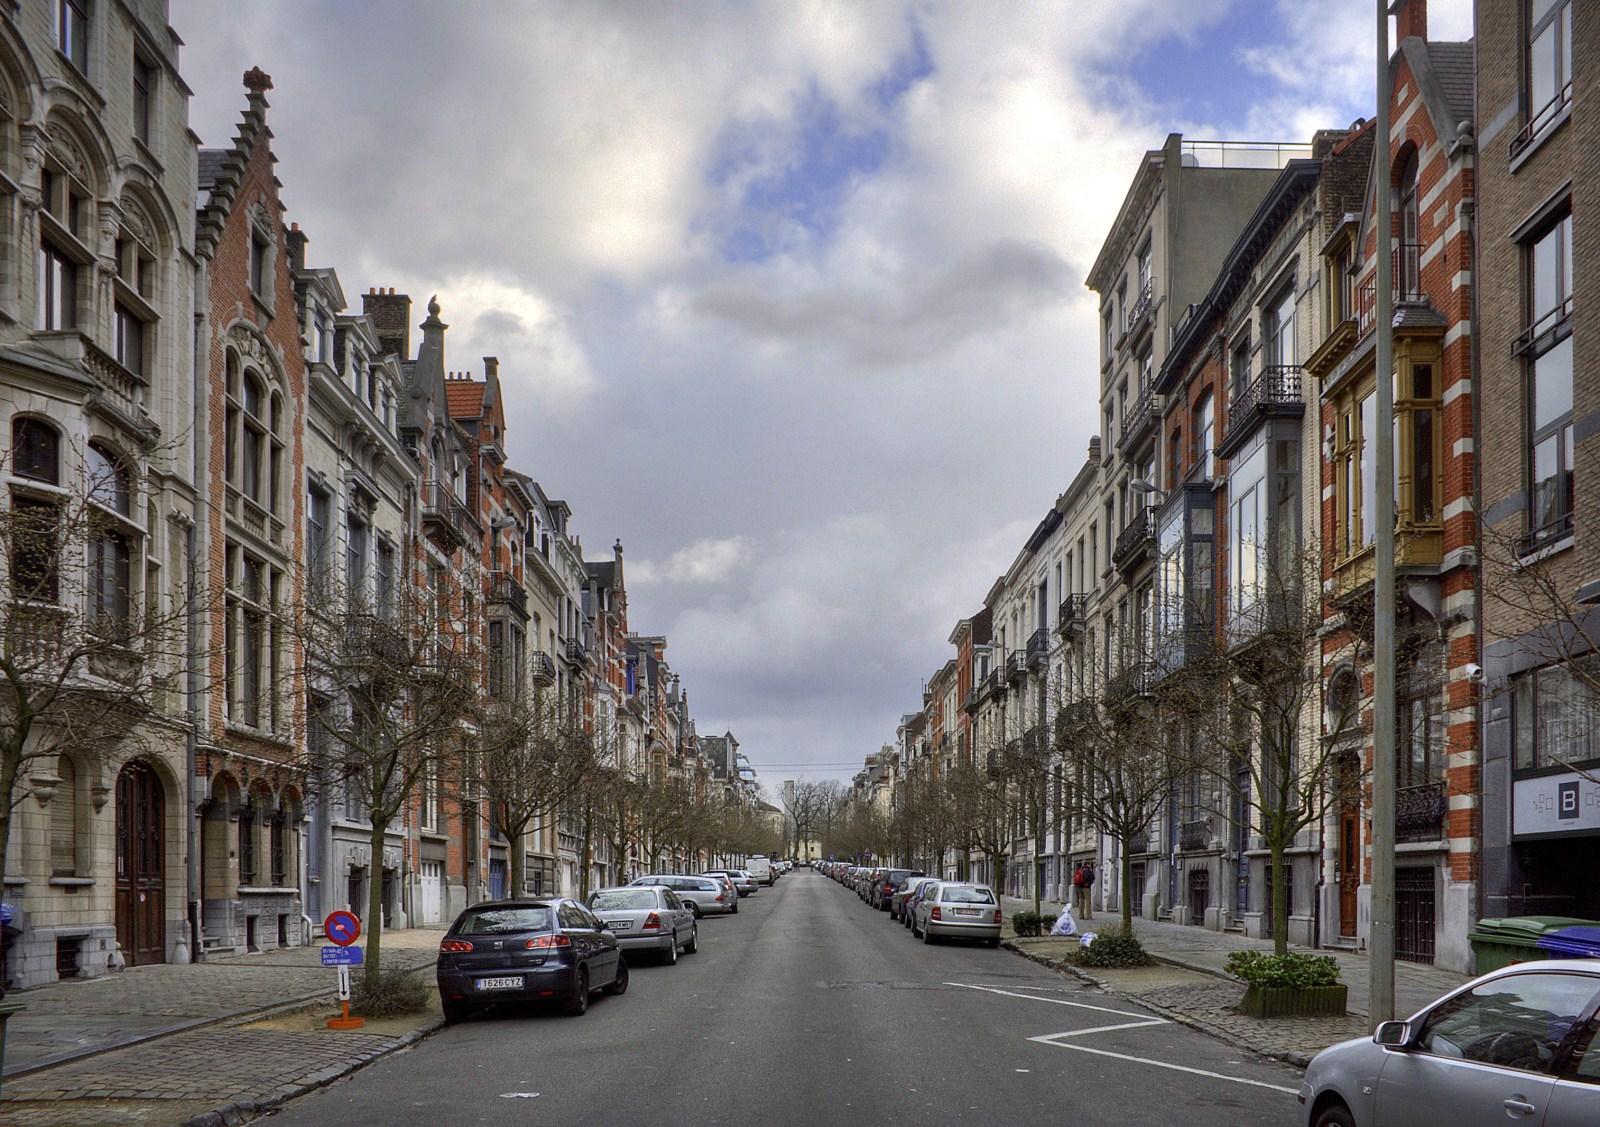 Avenue Michel Ange Vue Depuis Square Ambiorix C V Brunetta M Eberlin 2009